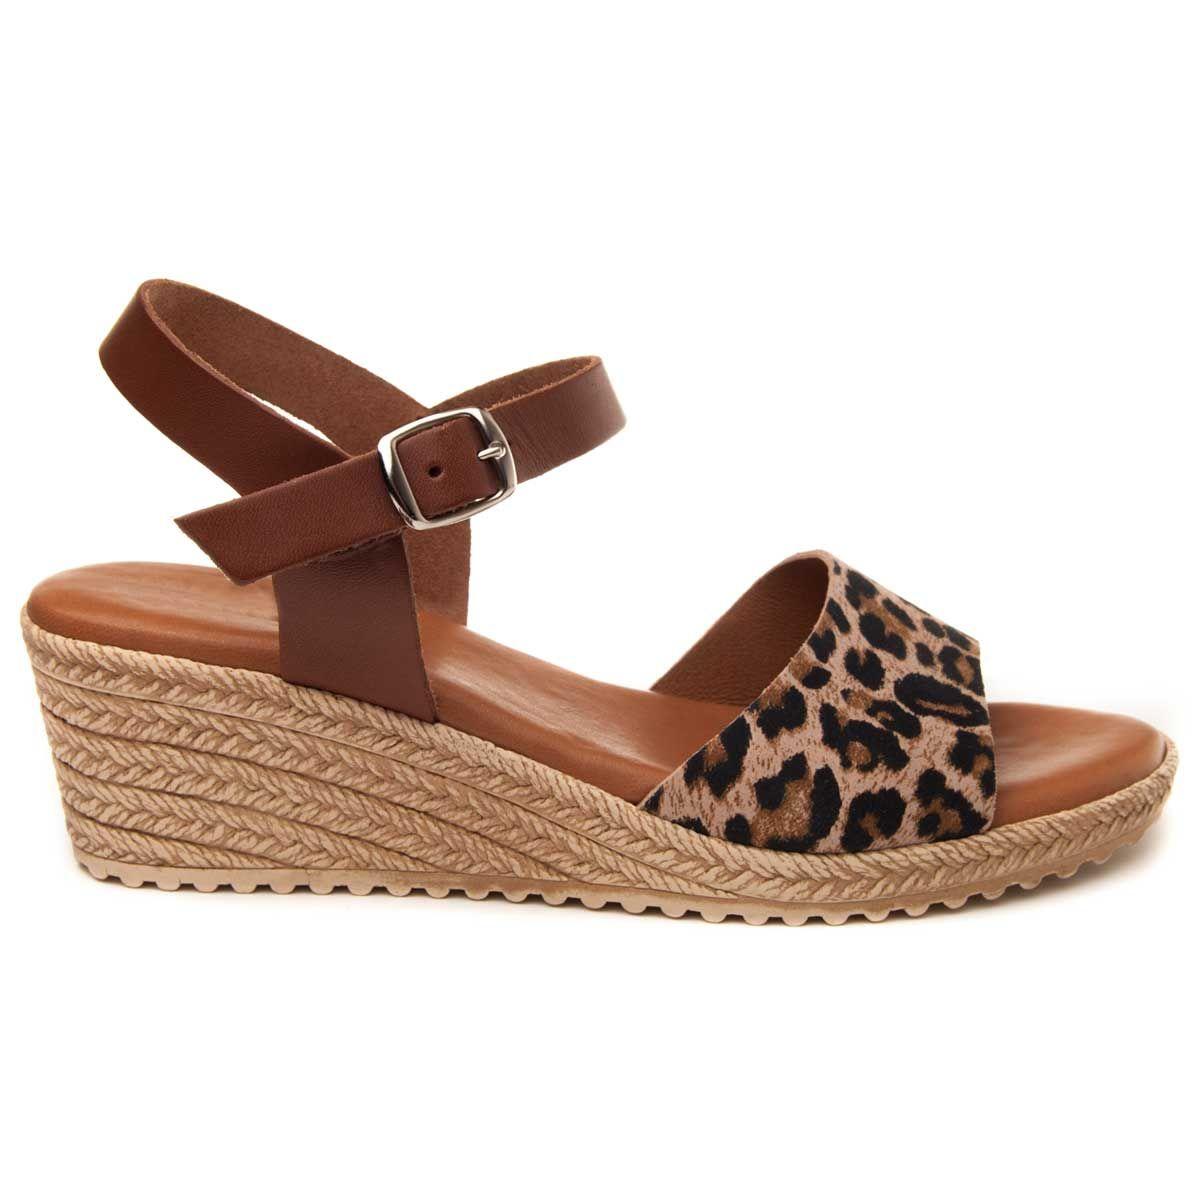 Montevita Chunky Heel Sandal in Brown